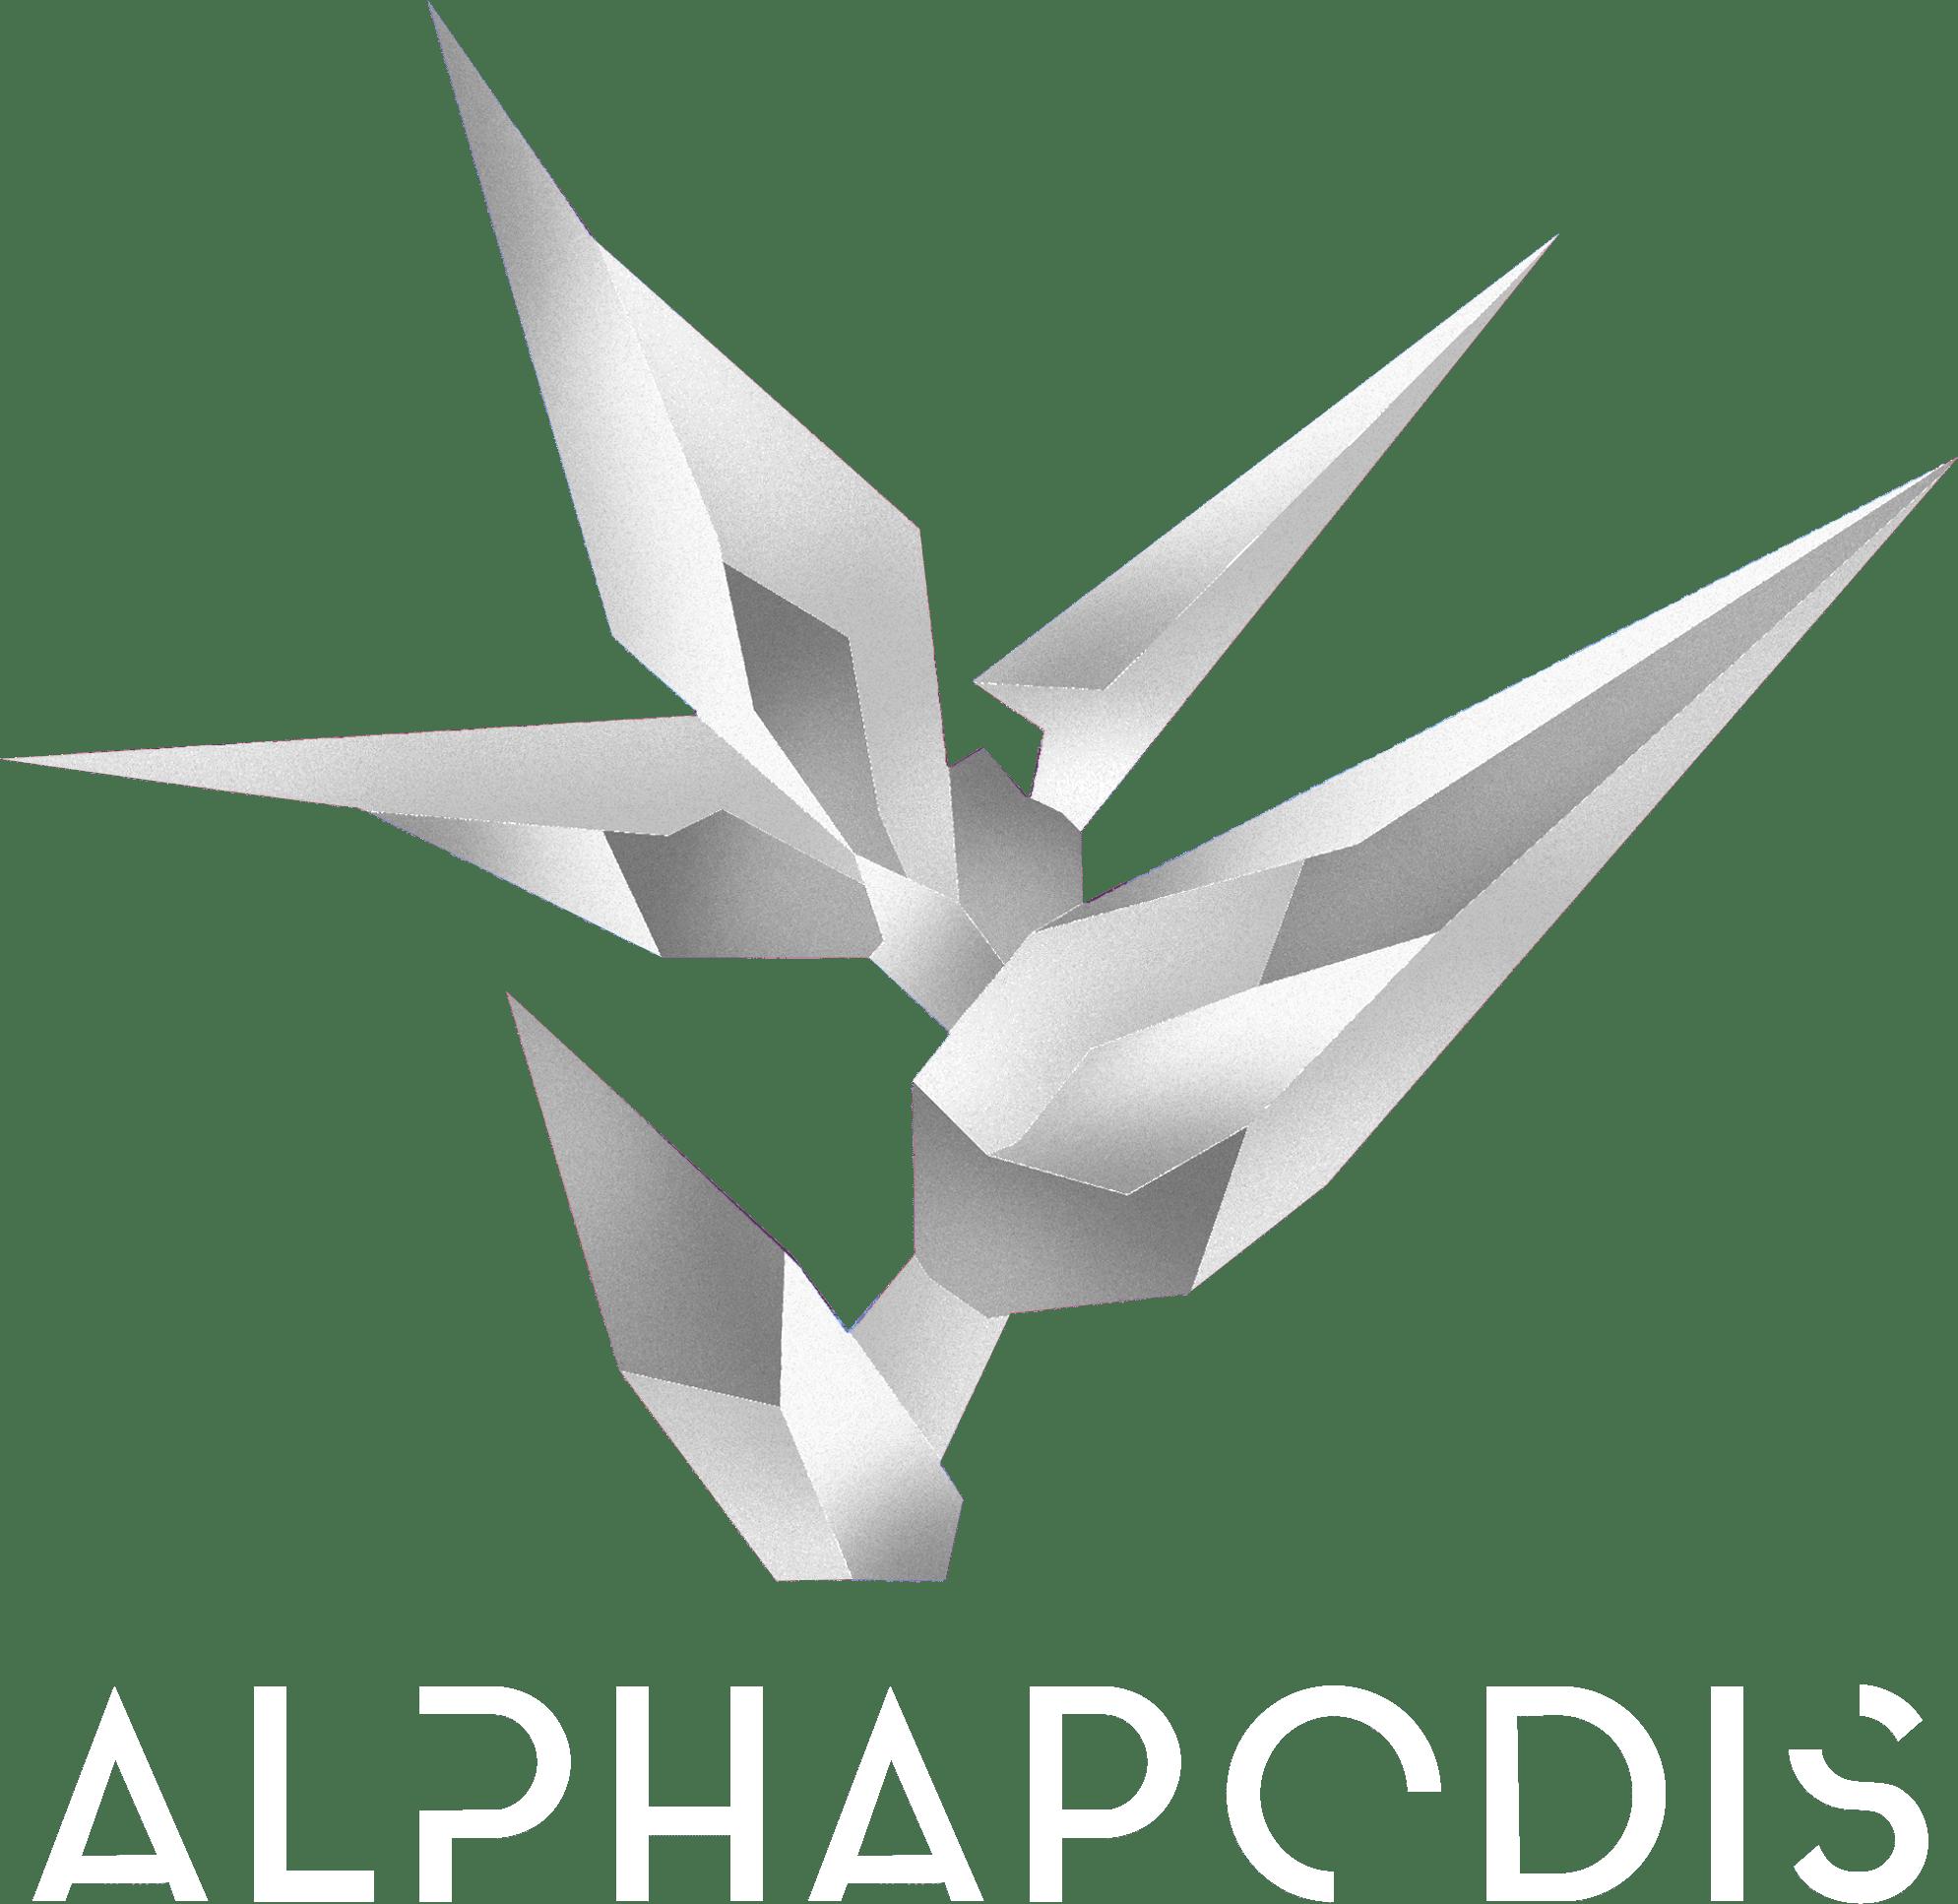 ALPHAPODIS